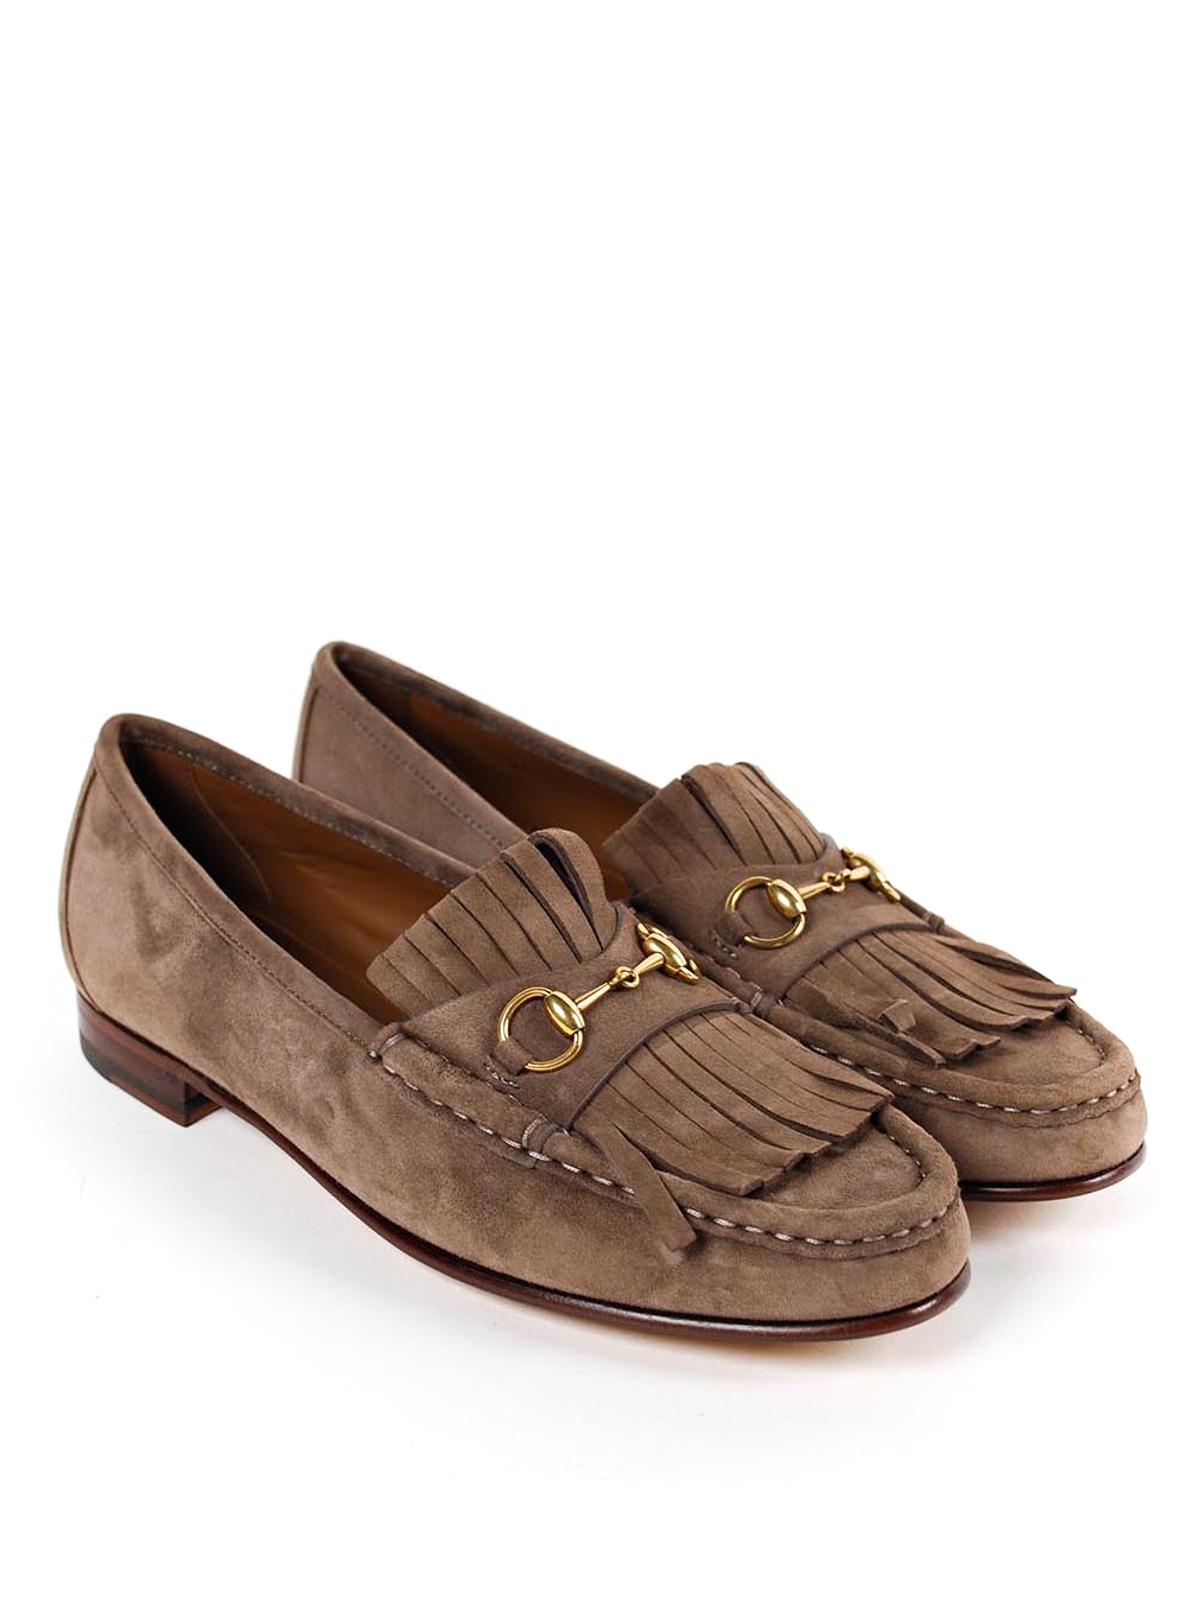 Black Suede Shoes Men Loafers